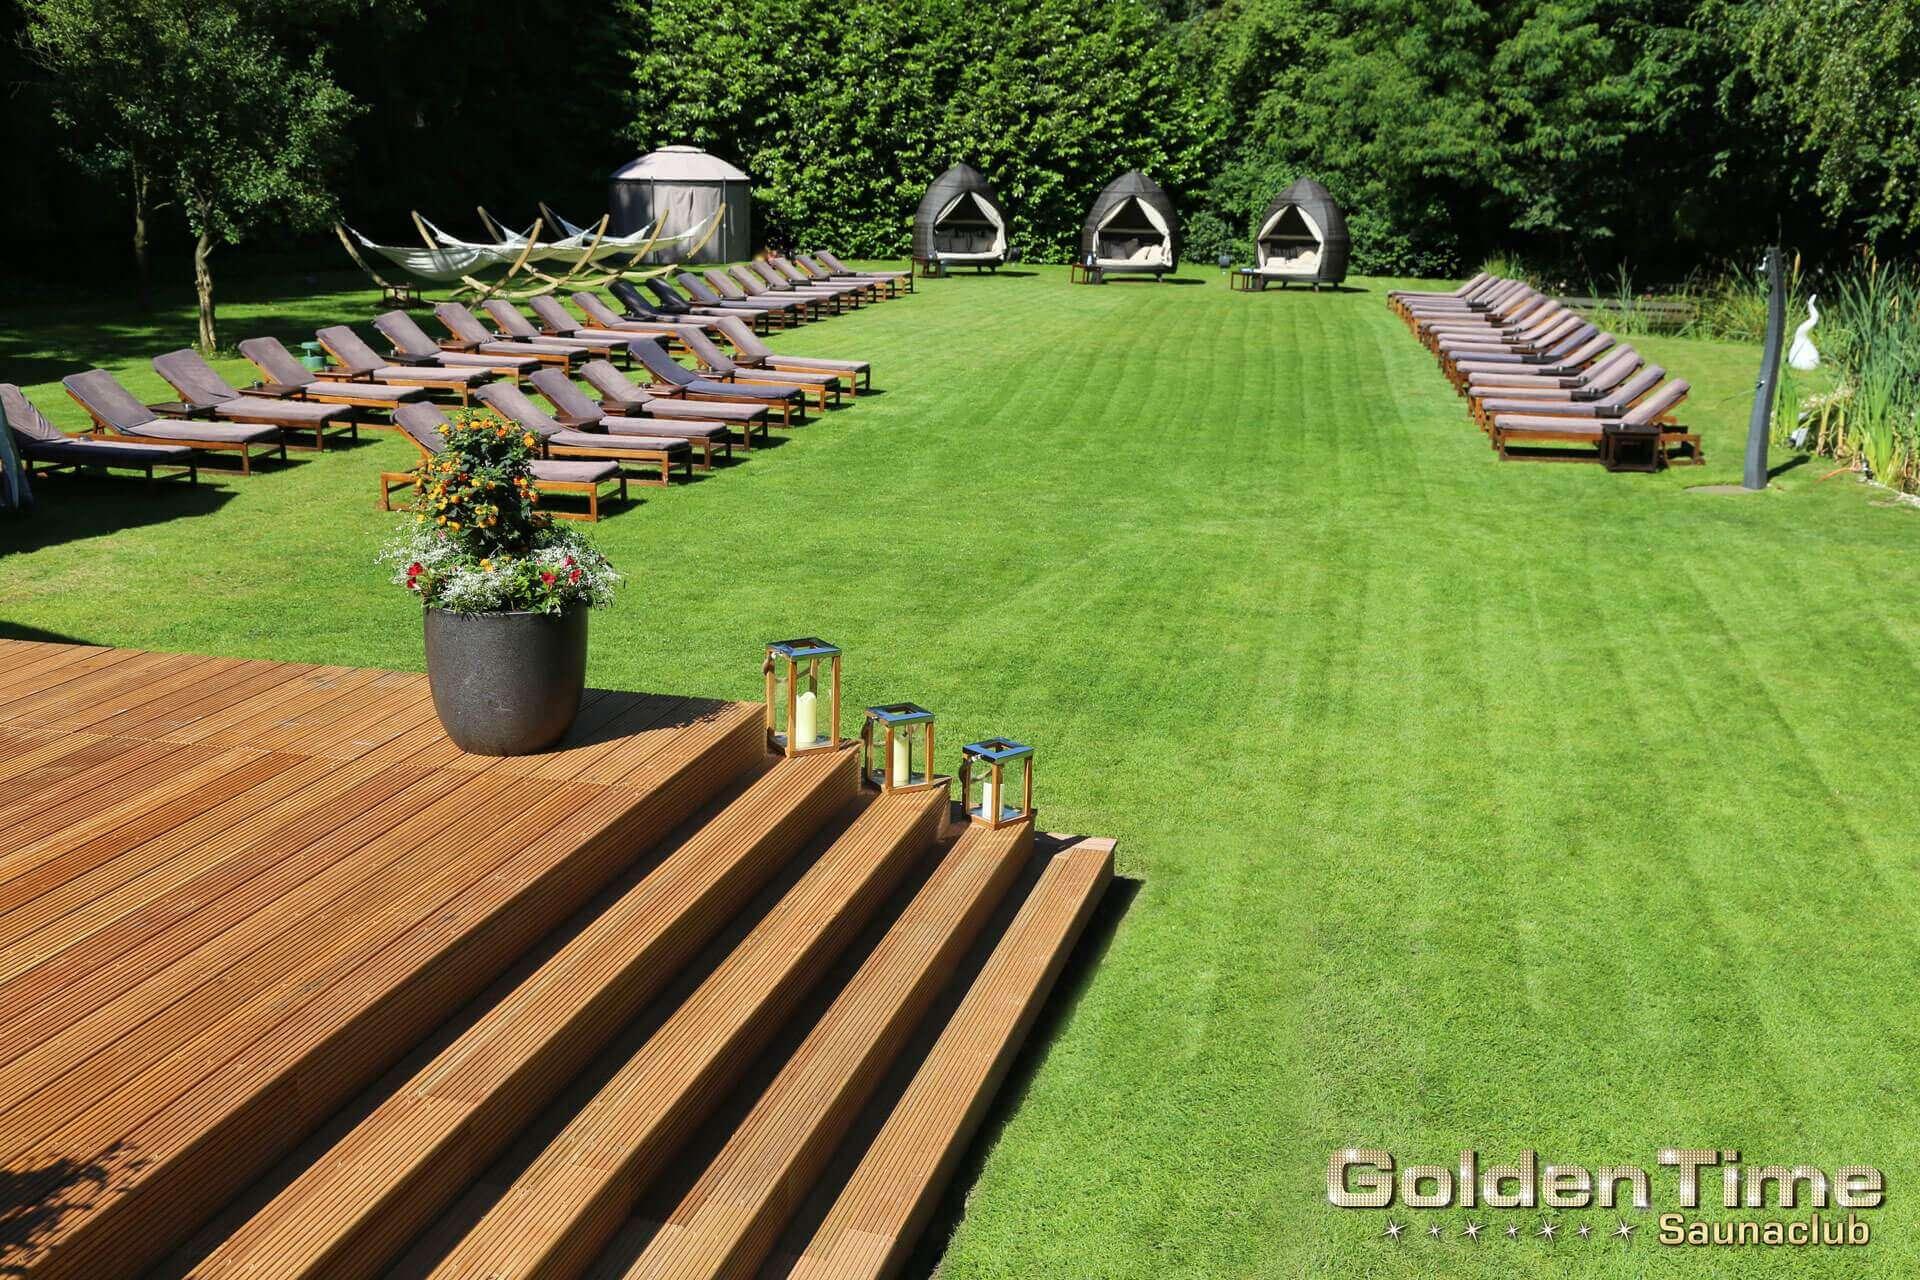 01-terrasse-pic-07-goldentime-saunaclub.jpg